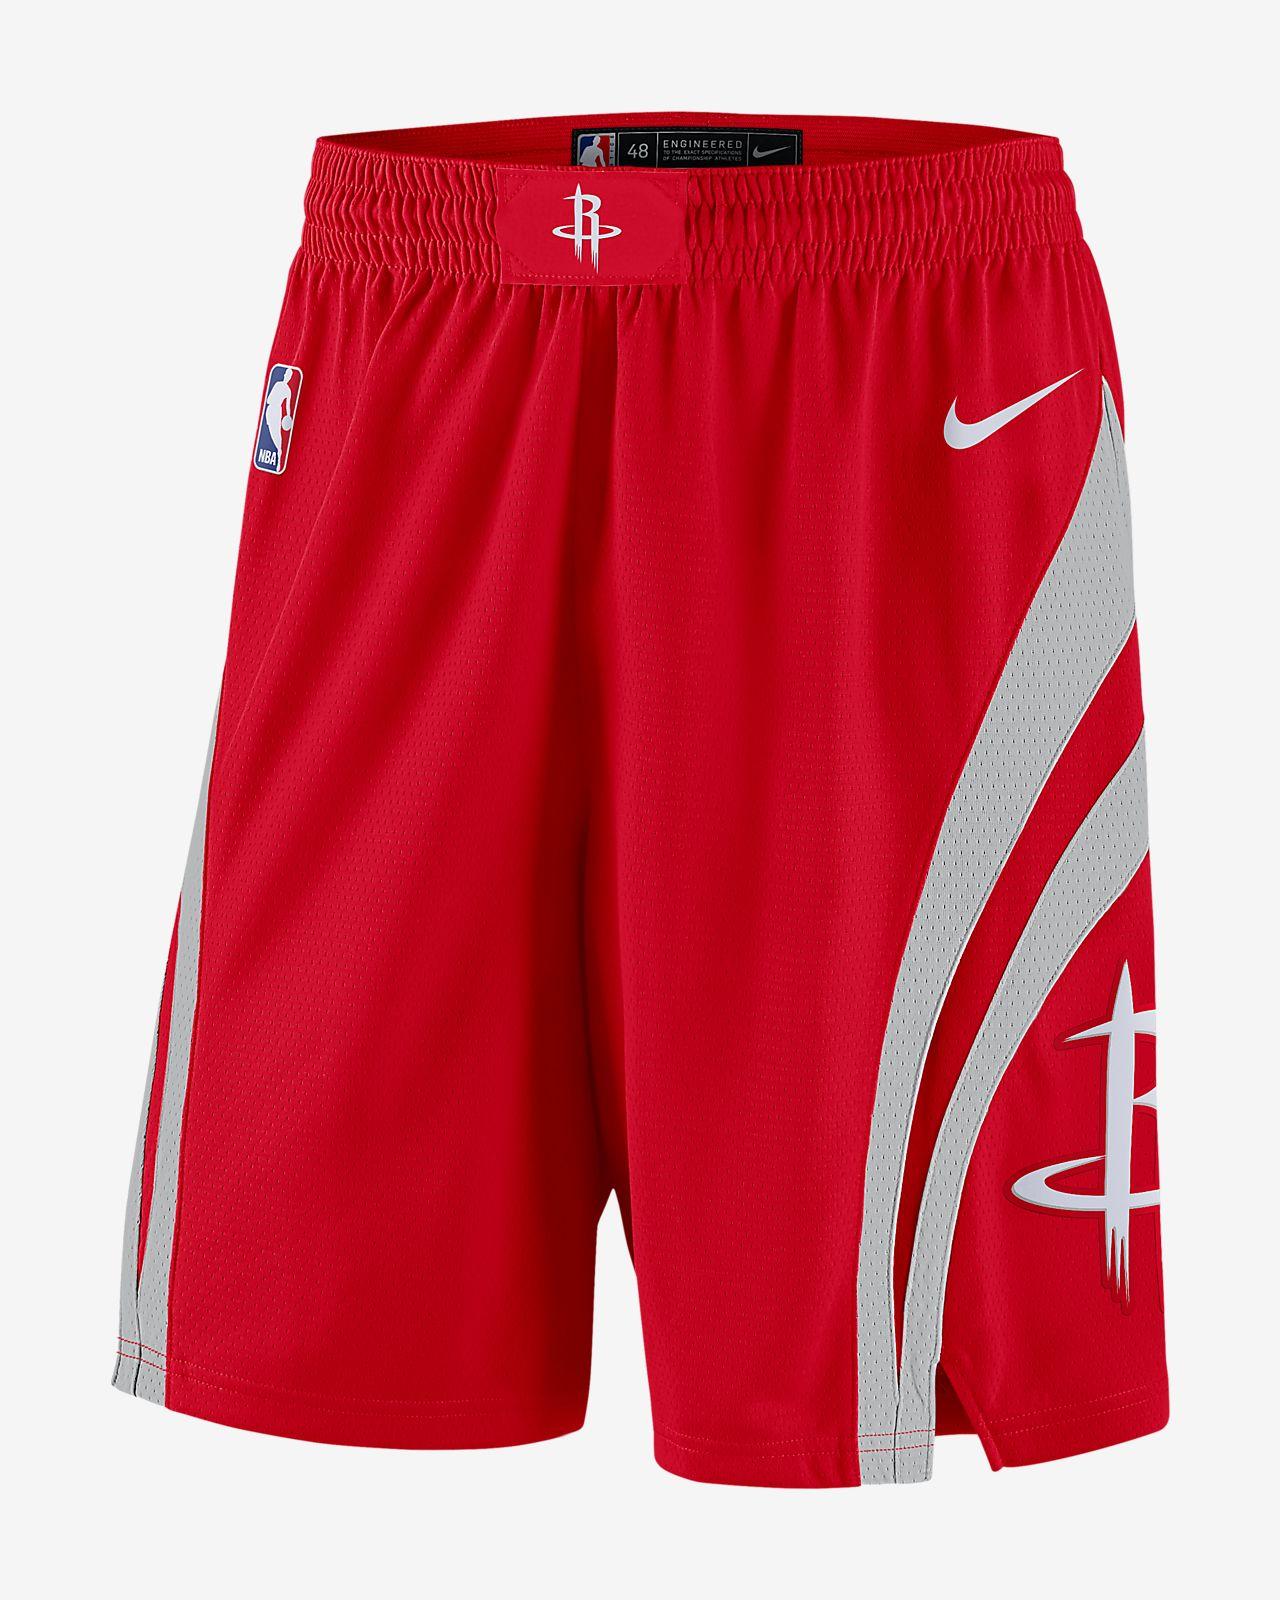 7bf6345ac Houston Rockets Icon Edition Swingman Men s Nike NBA Shorts. Nike.com NZ